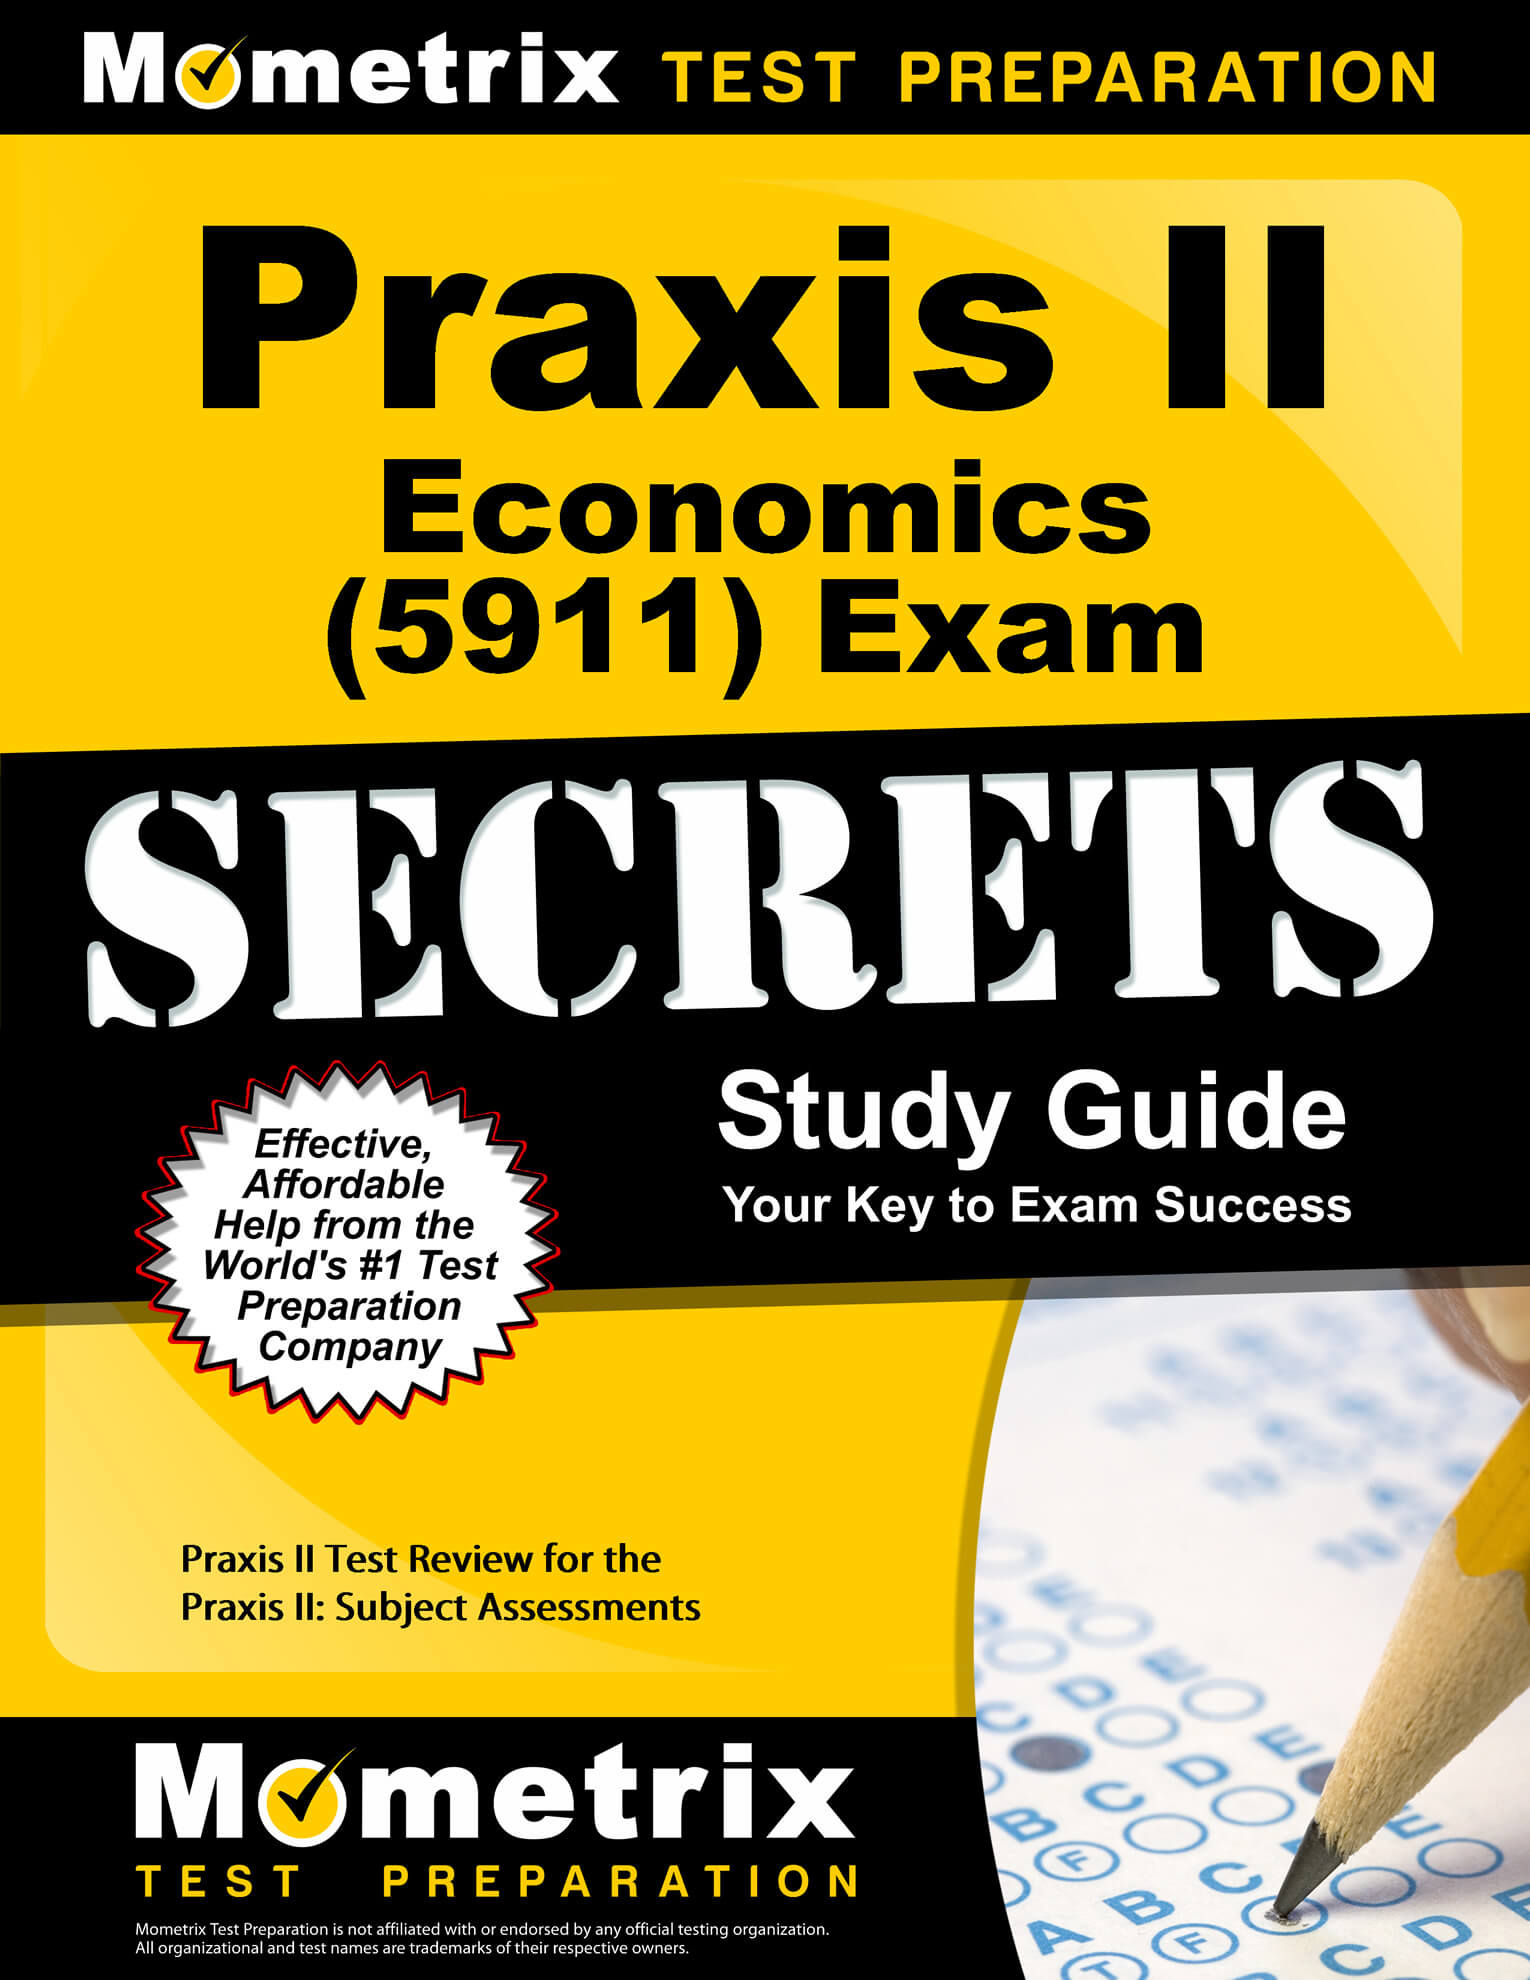 Praxis II Economics Study Guide